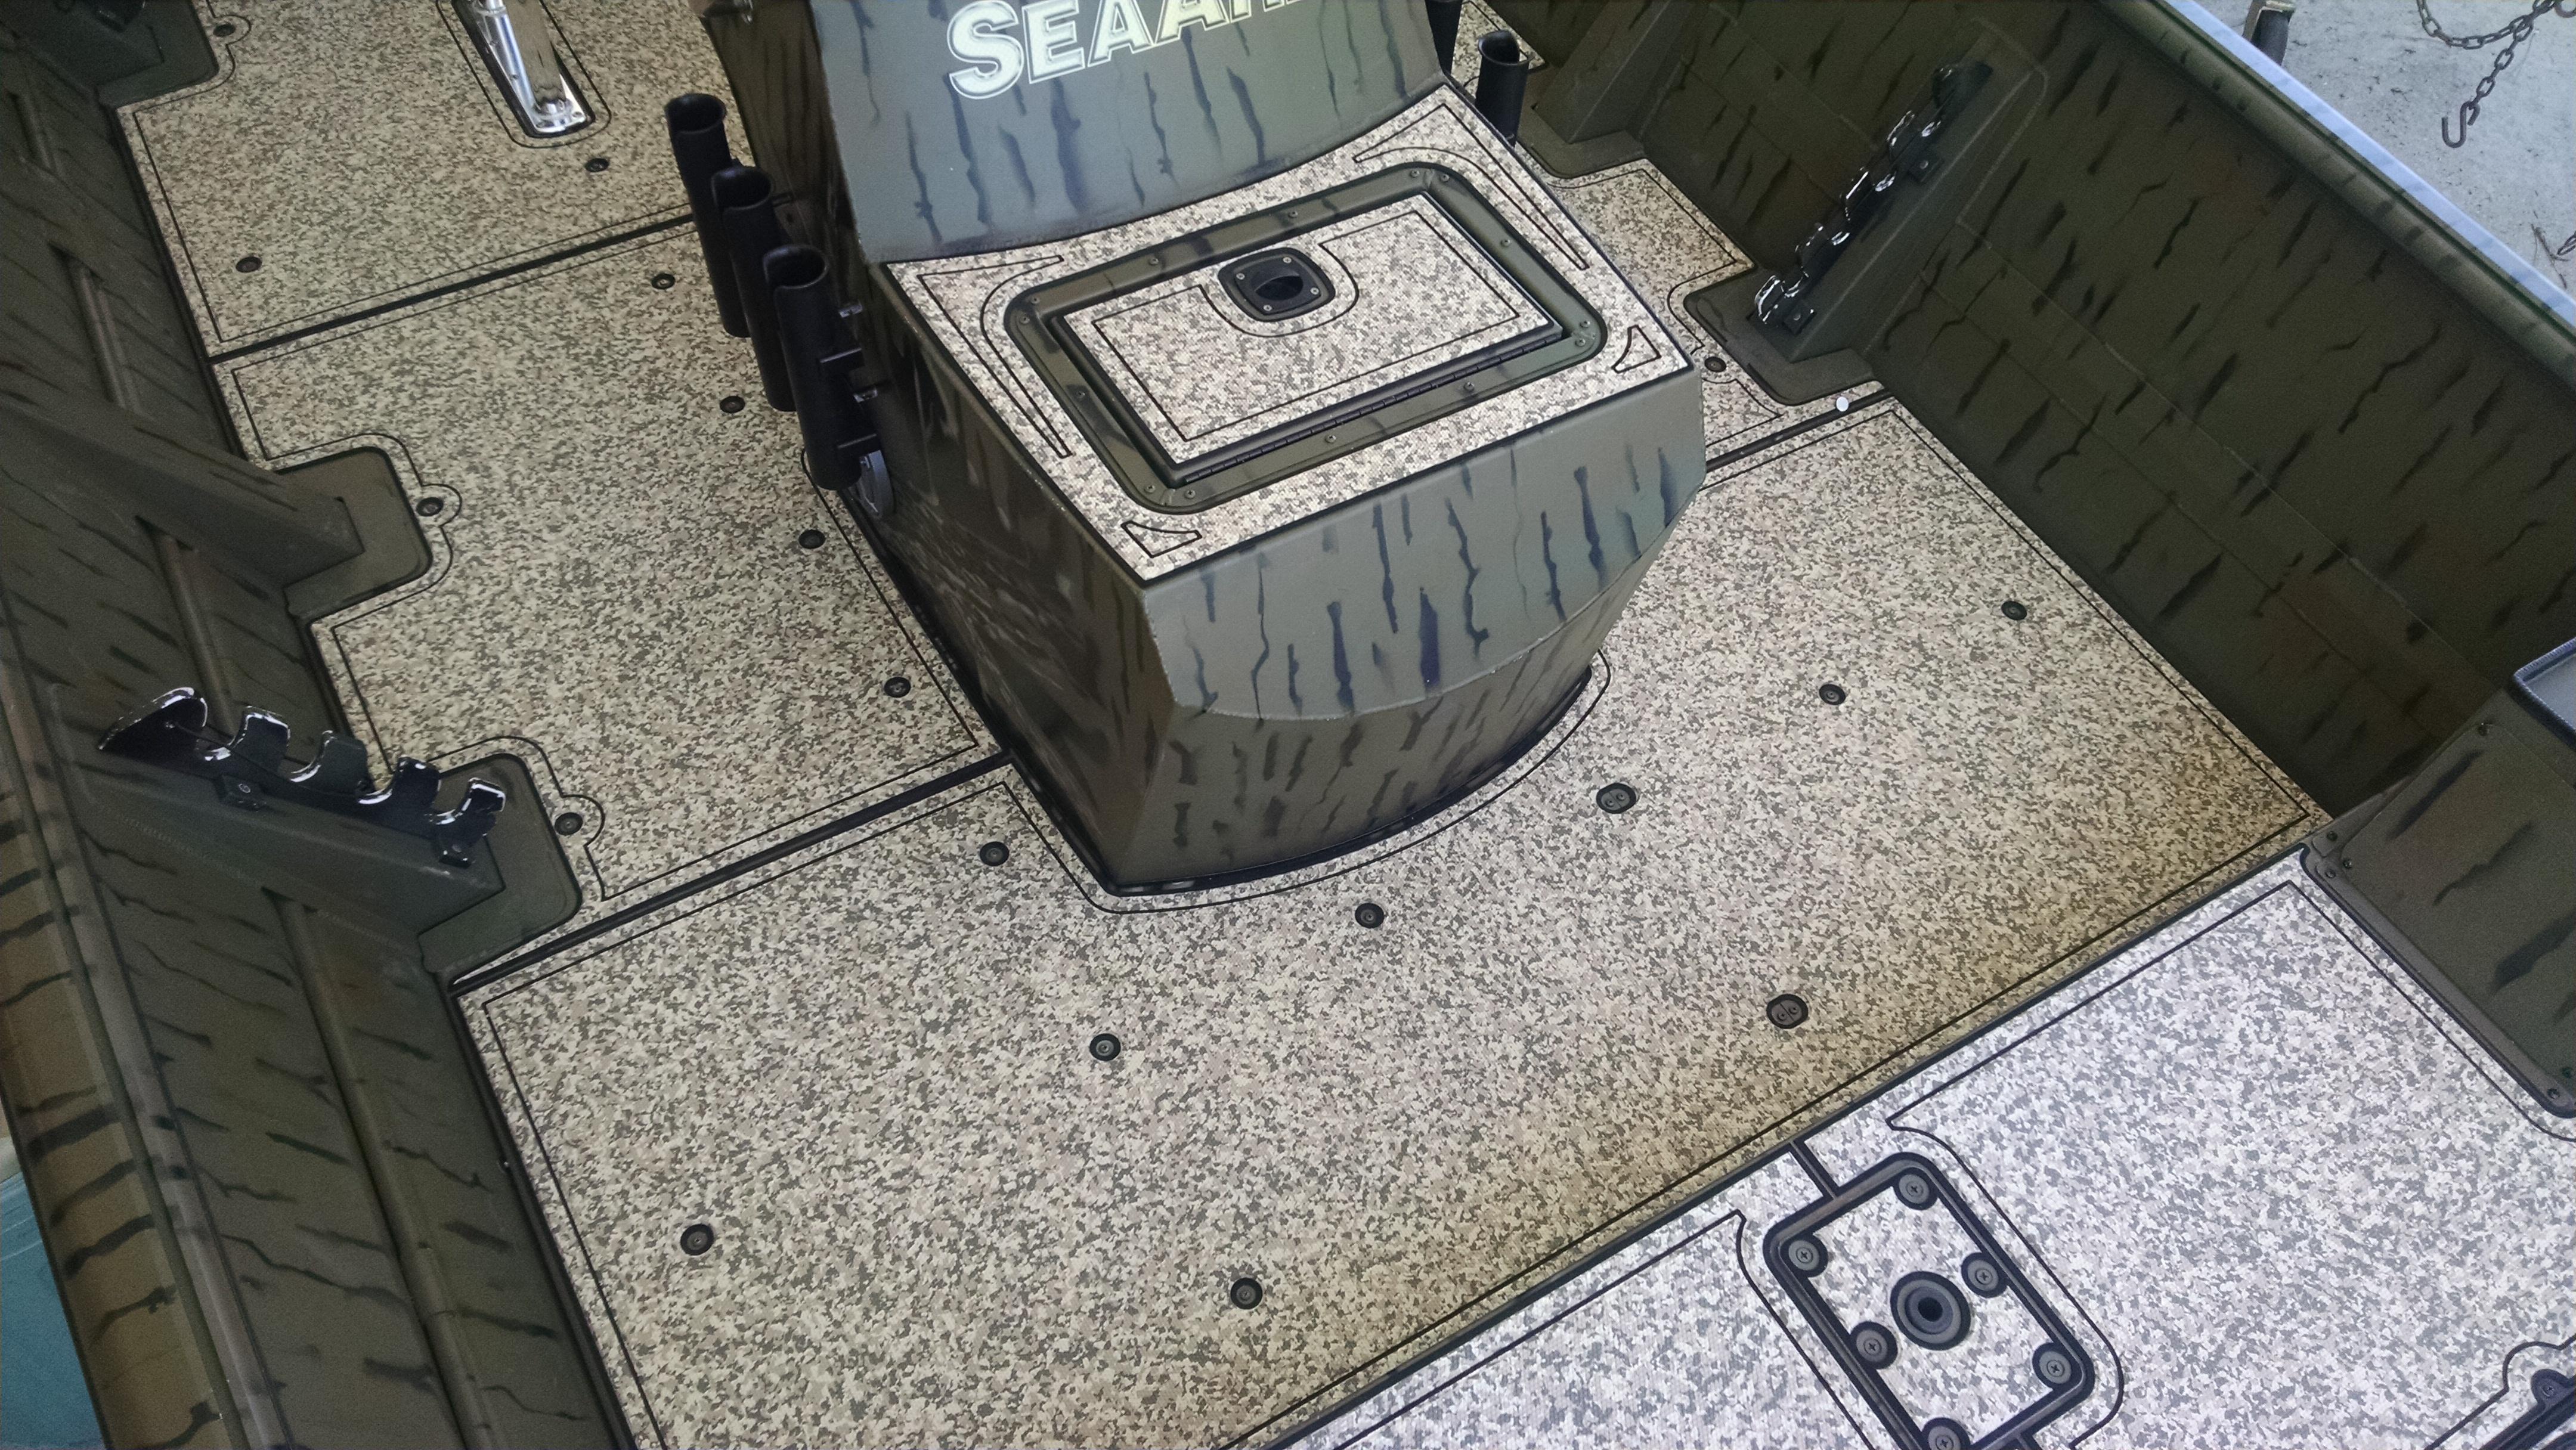 Seadek Marine Sheet Material 39 Inch X 77 Inch Desert Camo